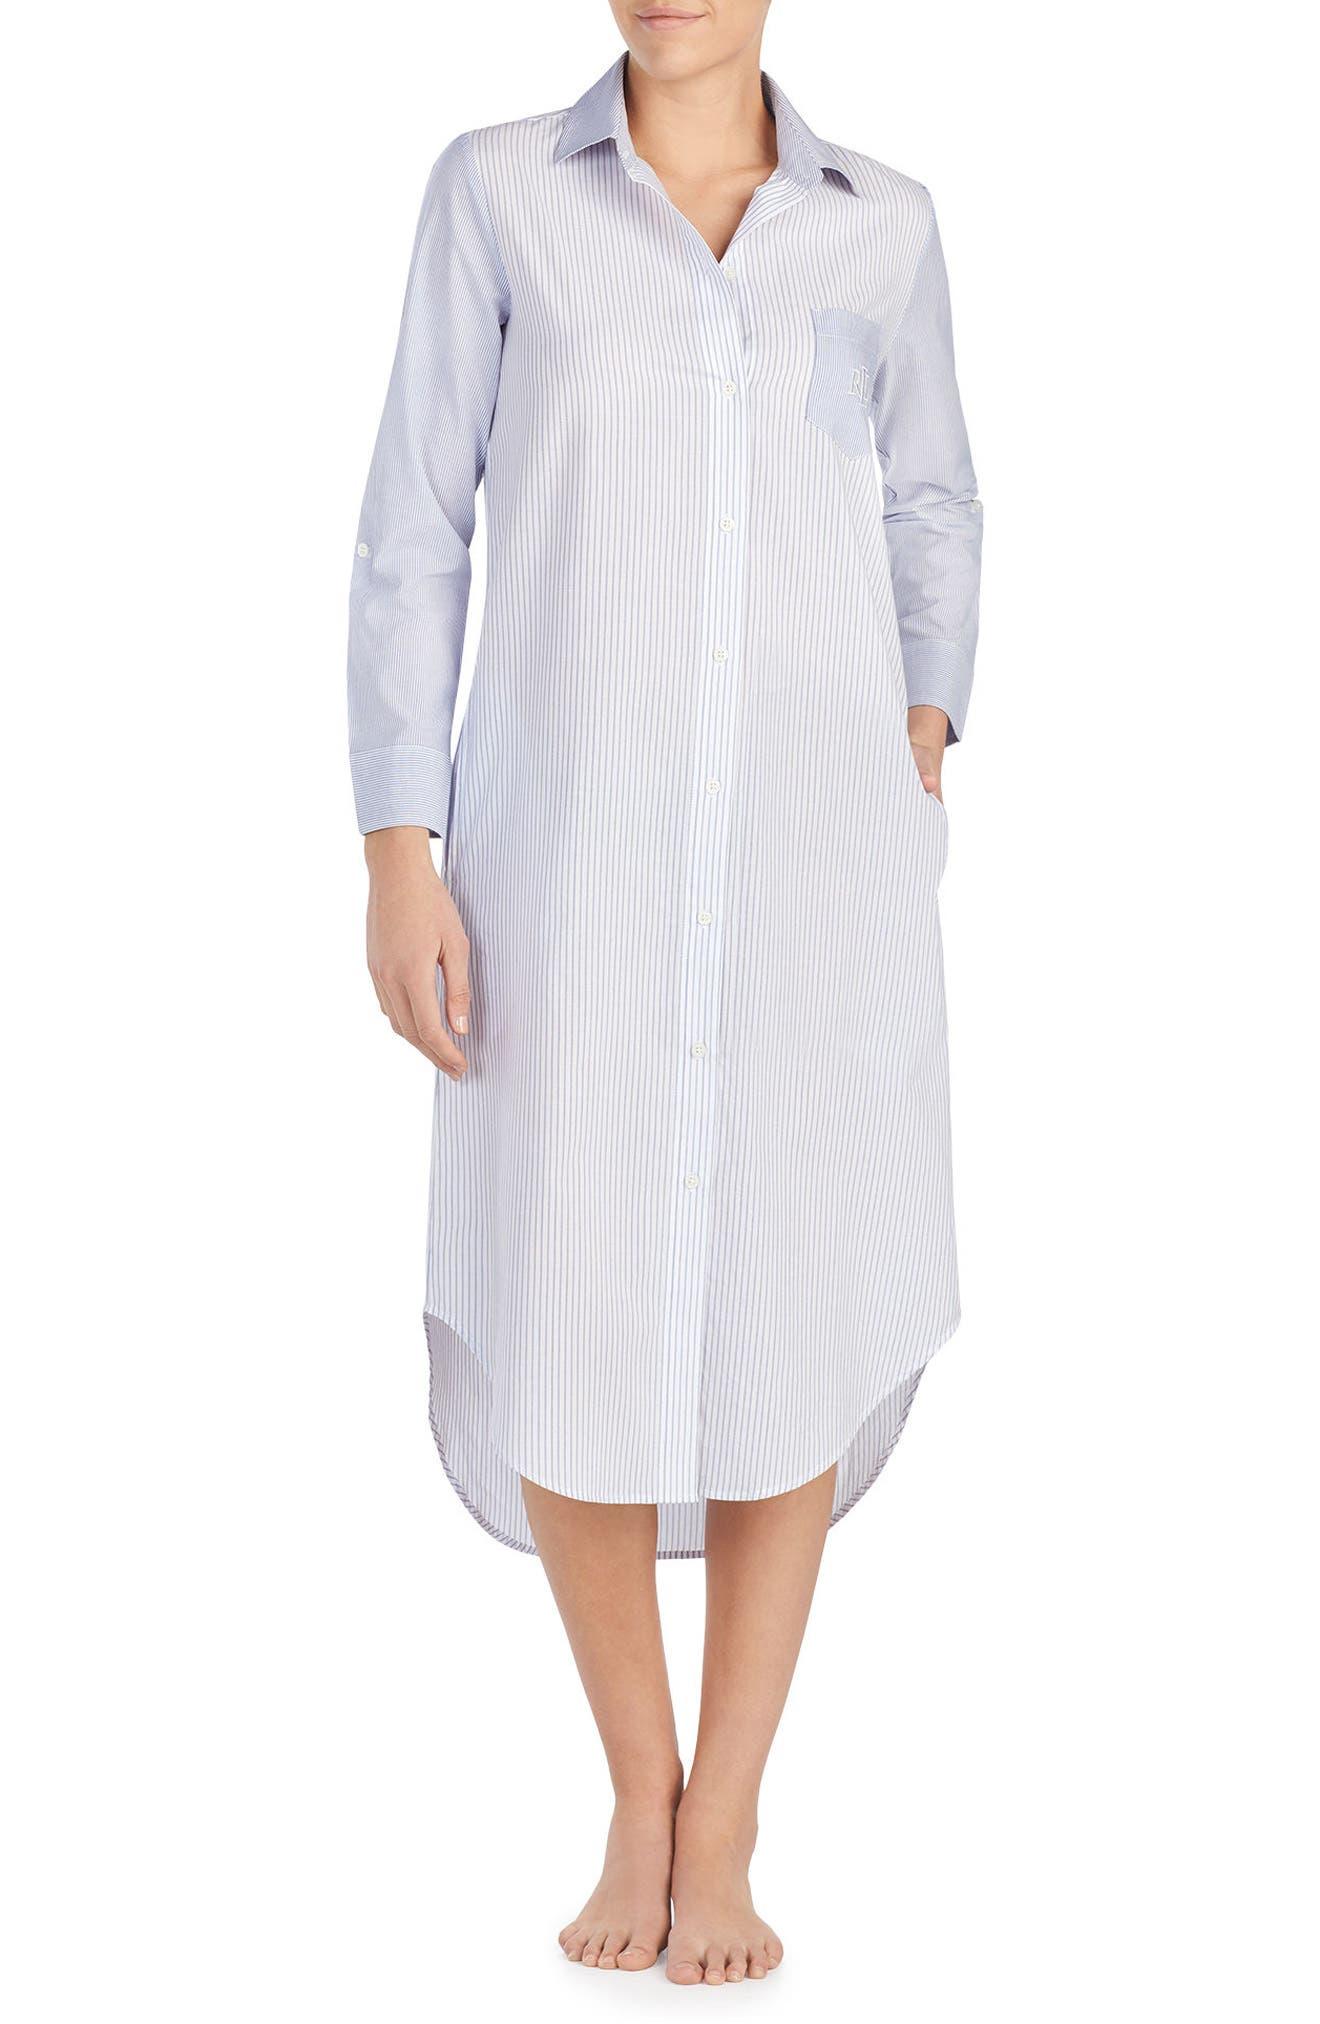 Sleep Shirt,                             Main thumbnail 1, color,                             WHITE STRIPE